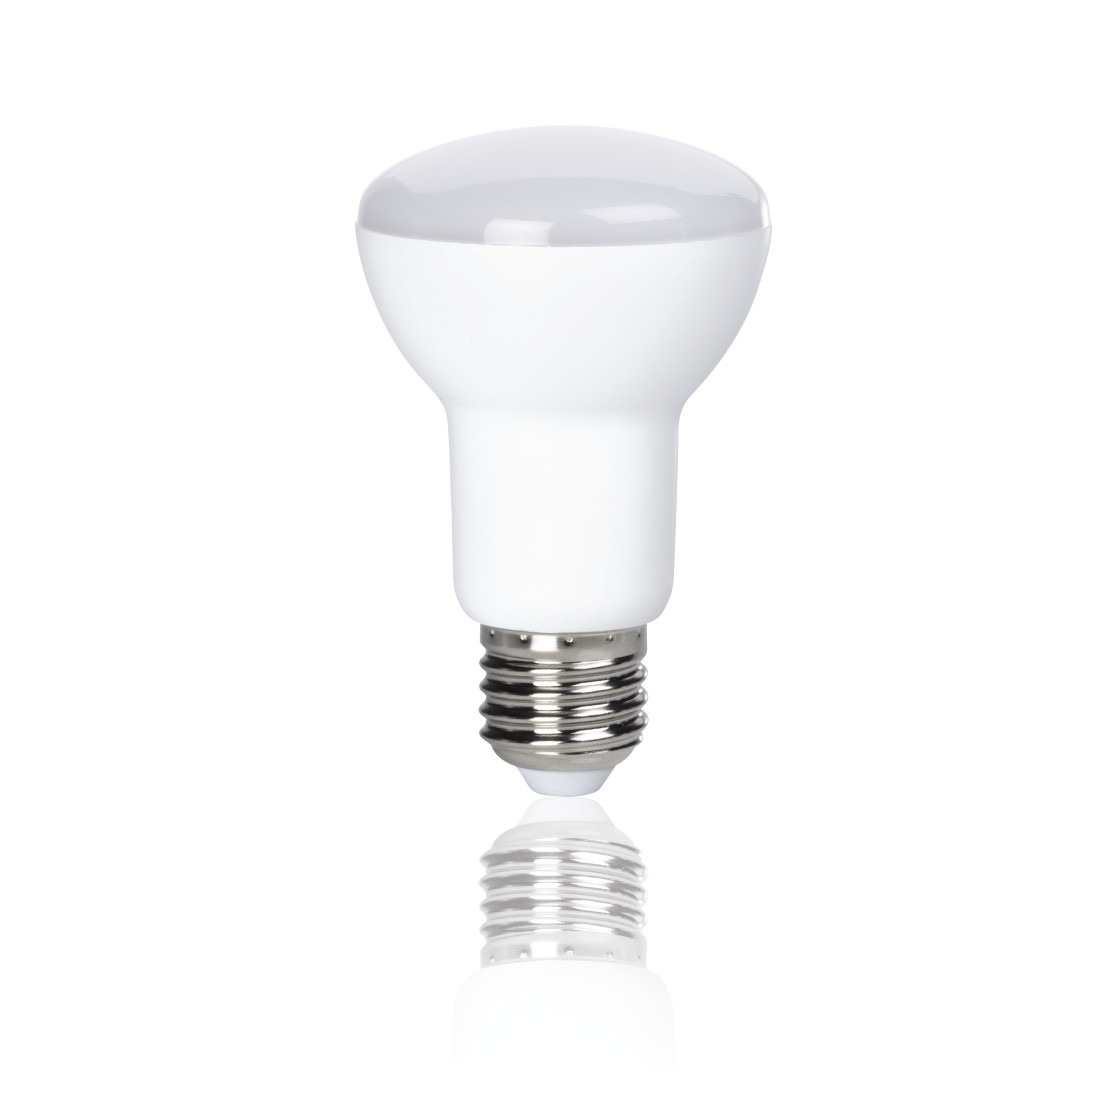 Korting Xavax Ledlamp, E27, 600lm vervangt 47W, reflectorlamp R63